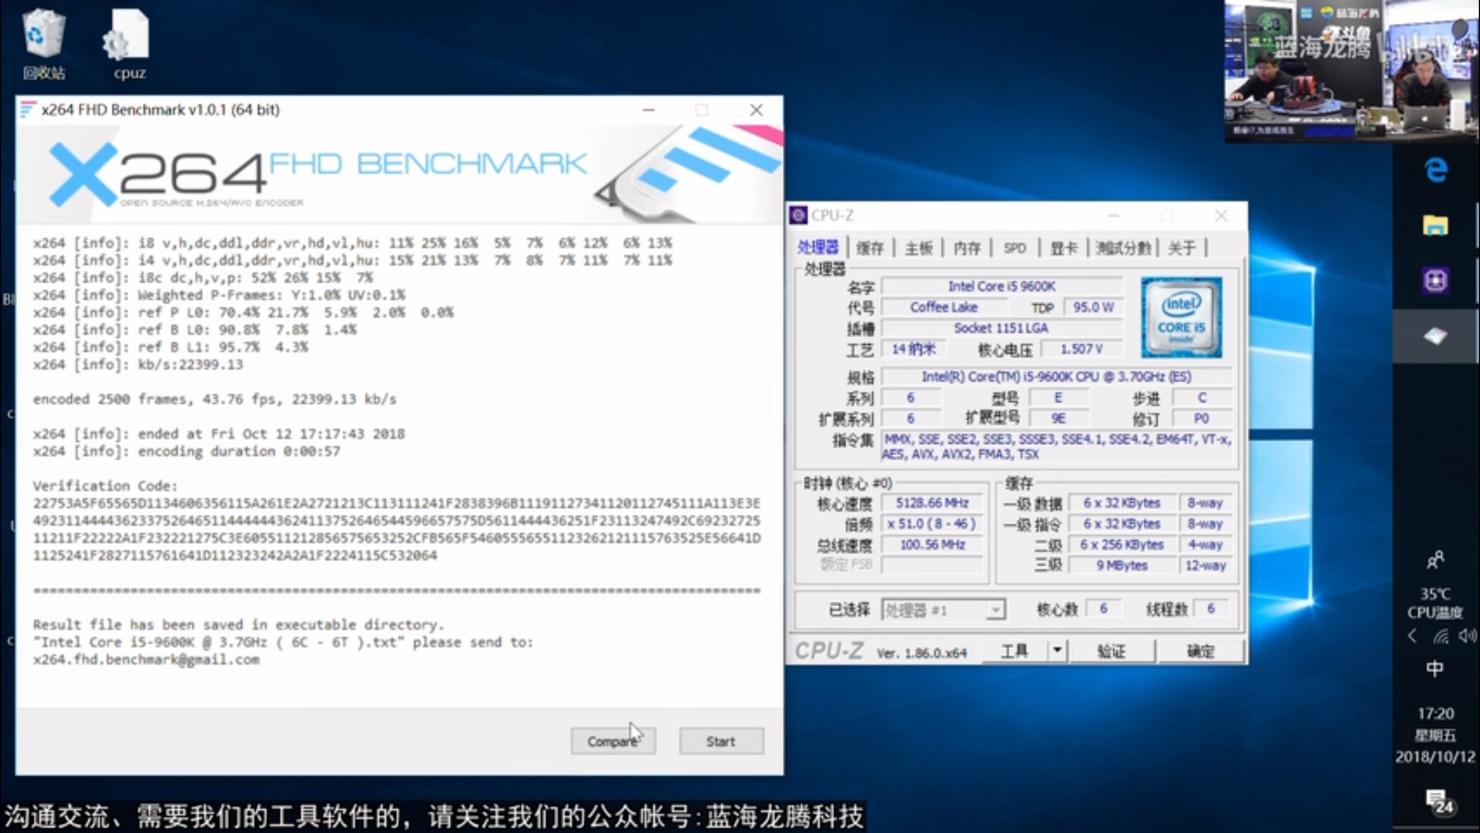 intel-core-i5-9600k-cpu-benchmarks_oc_3